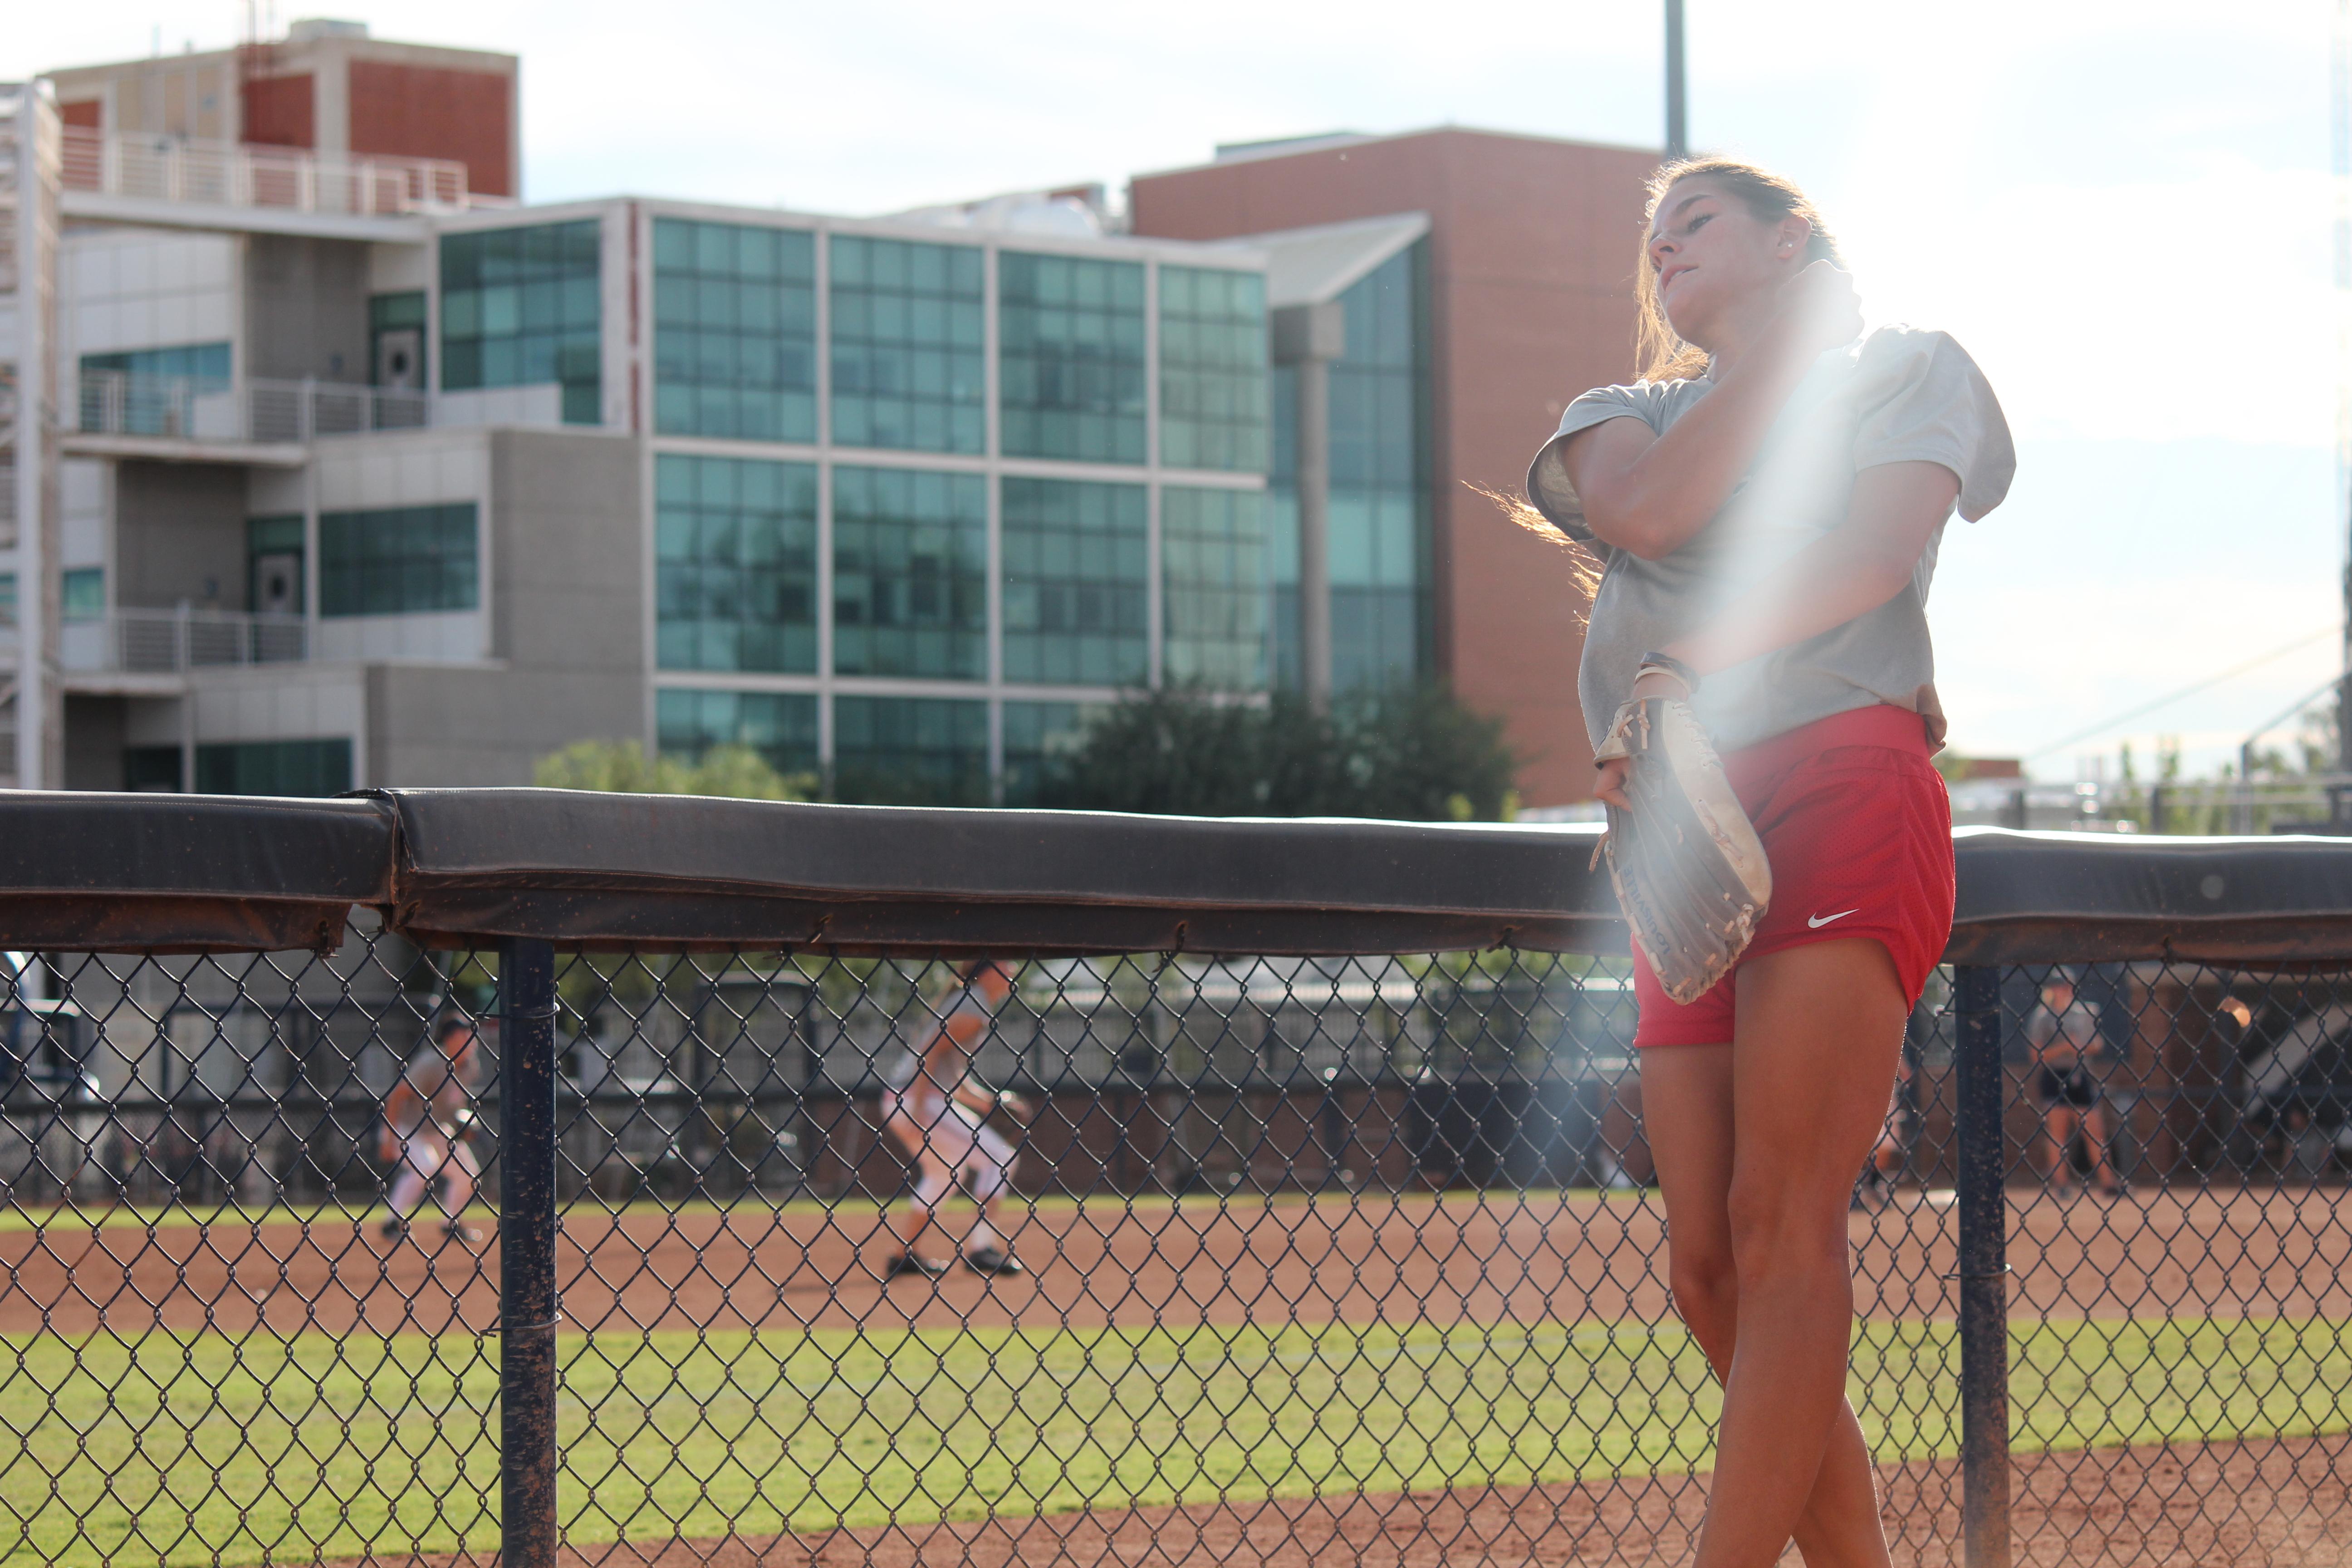 Softball pitcher with natural ligh